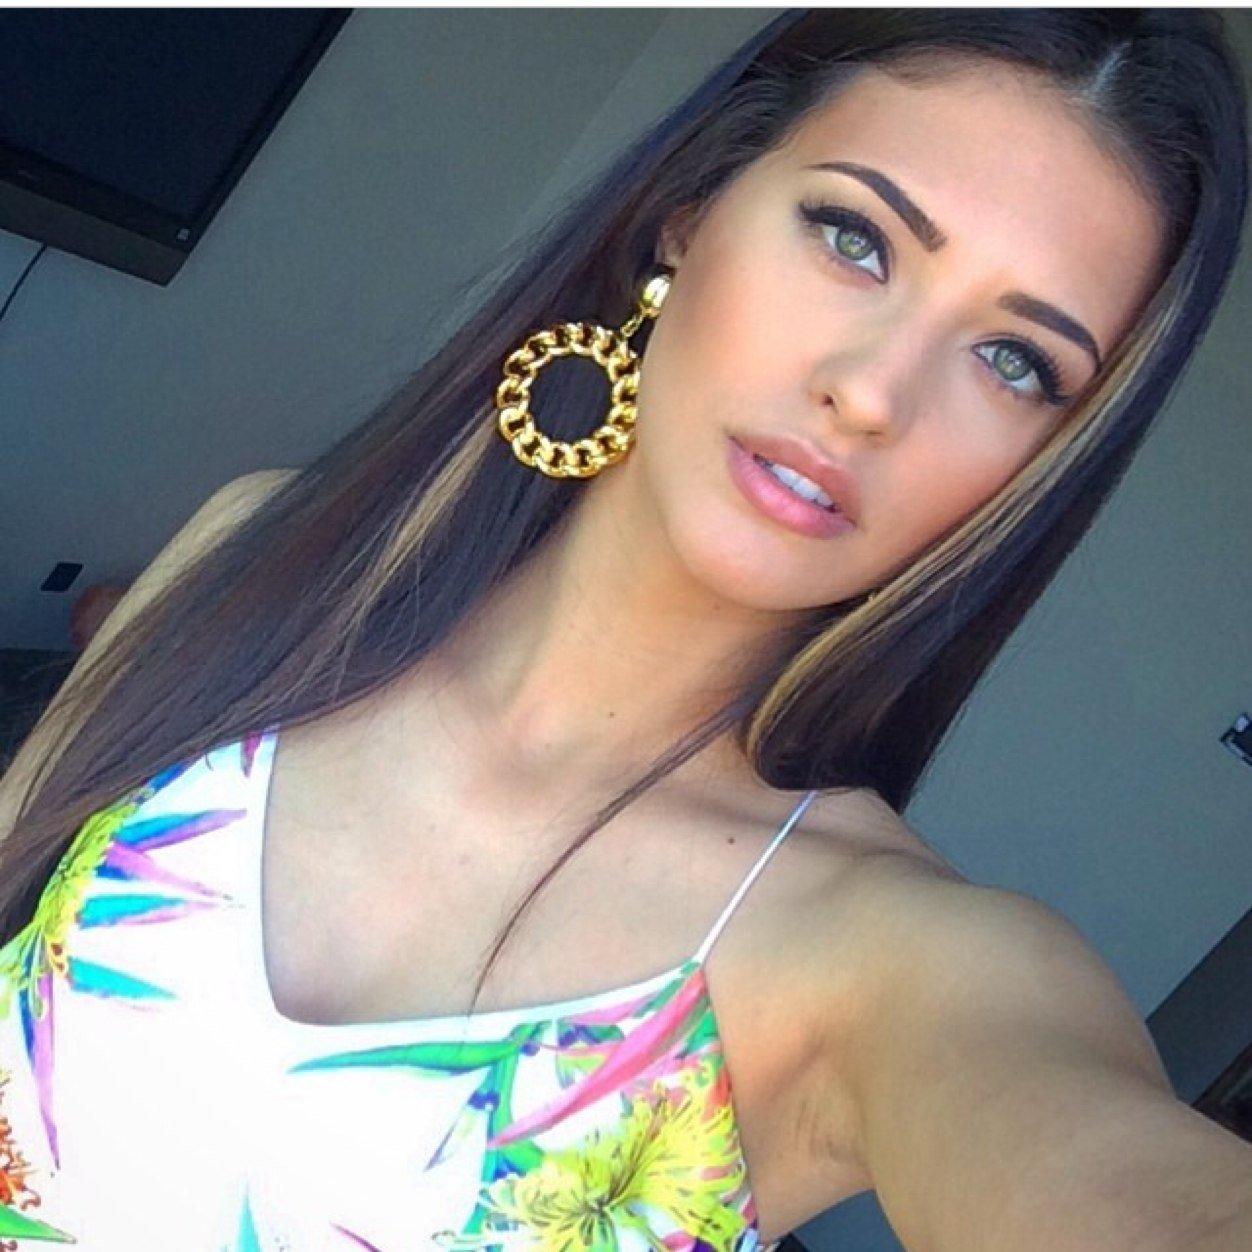 List of Romanian Girls Snapchat usernames